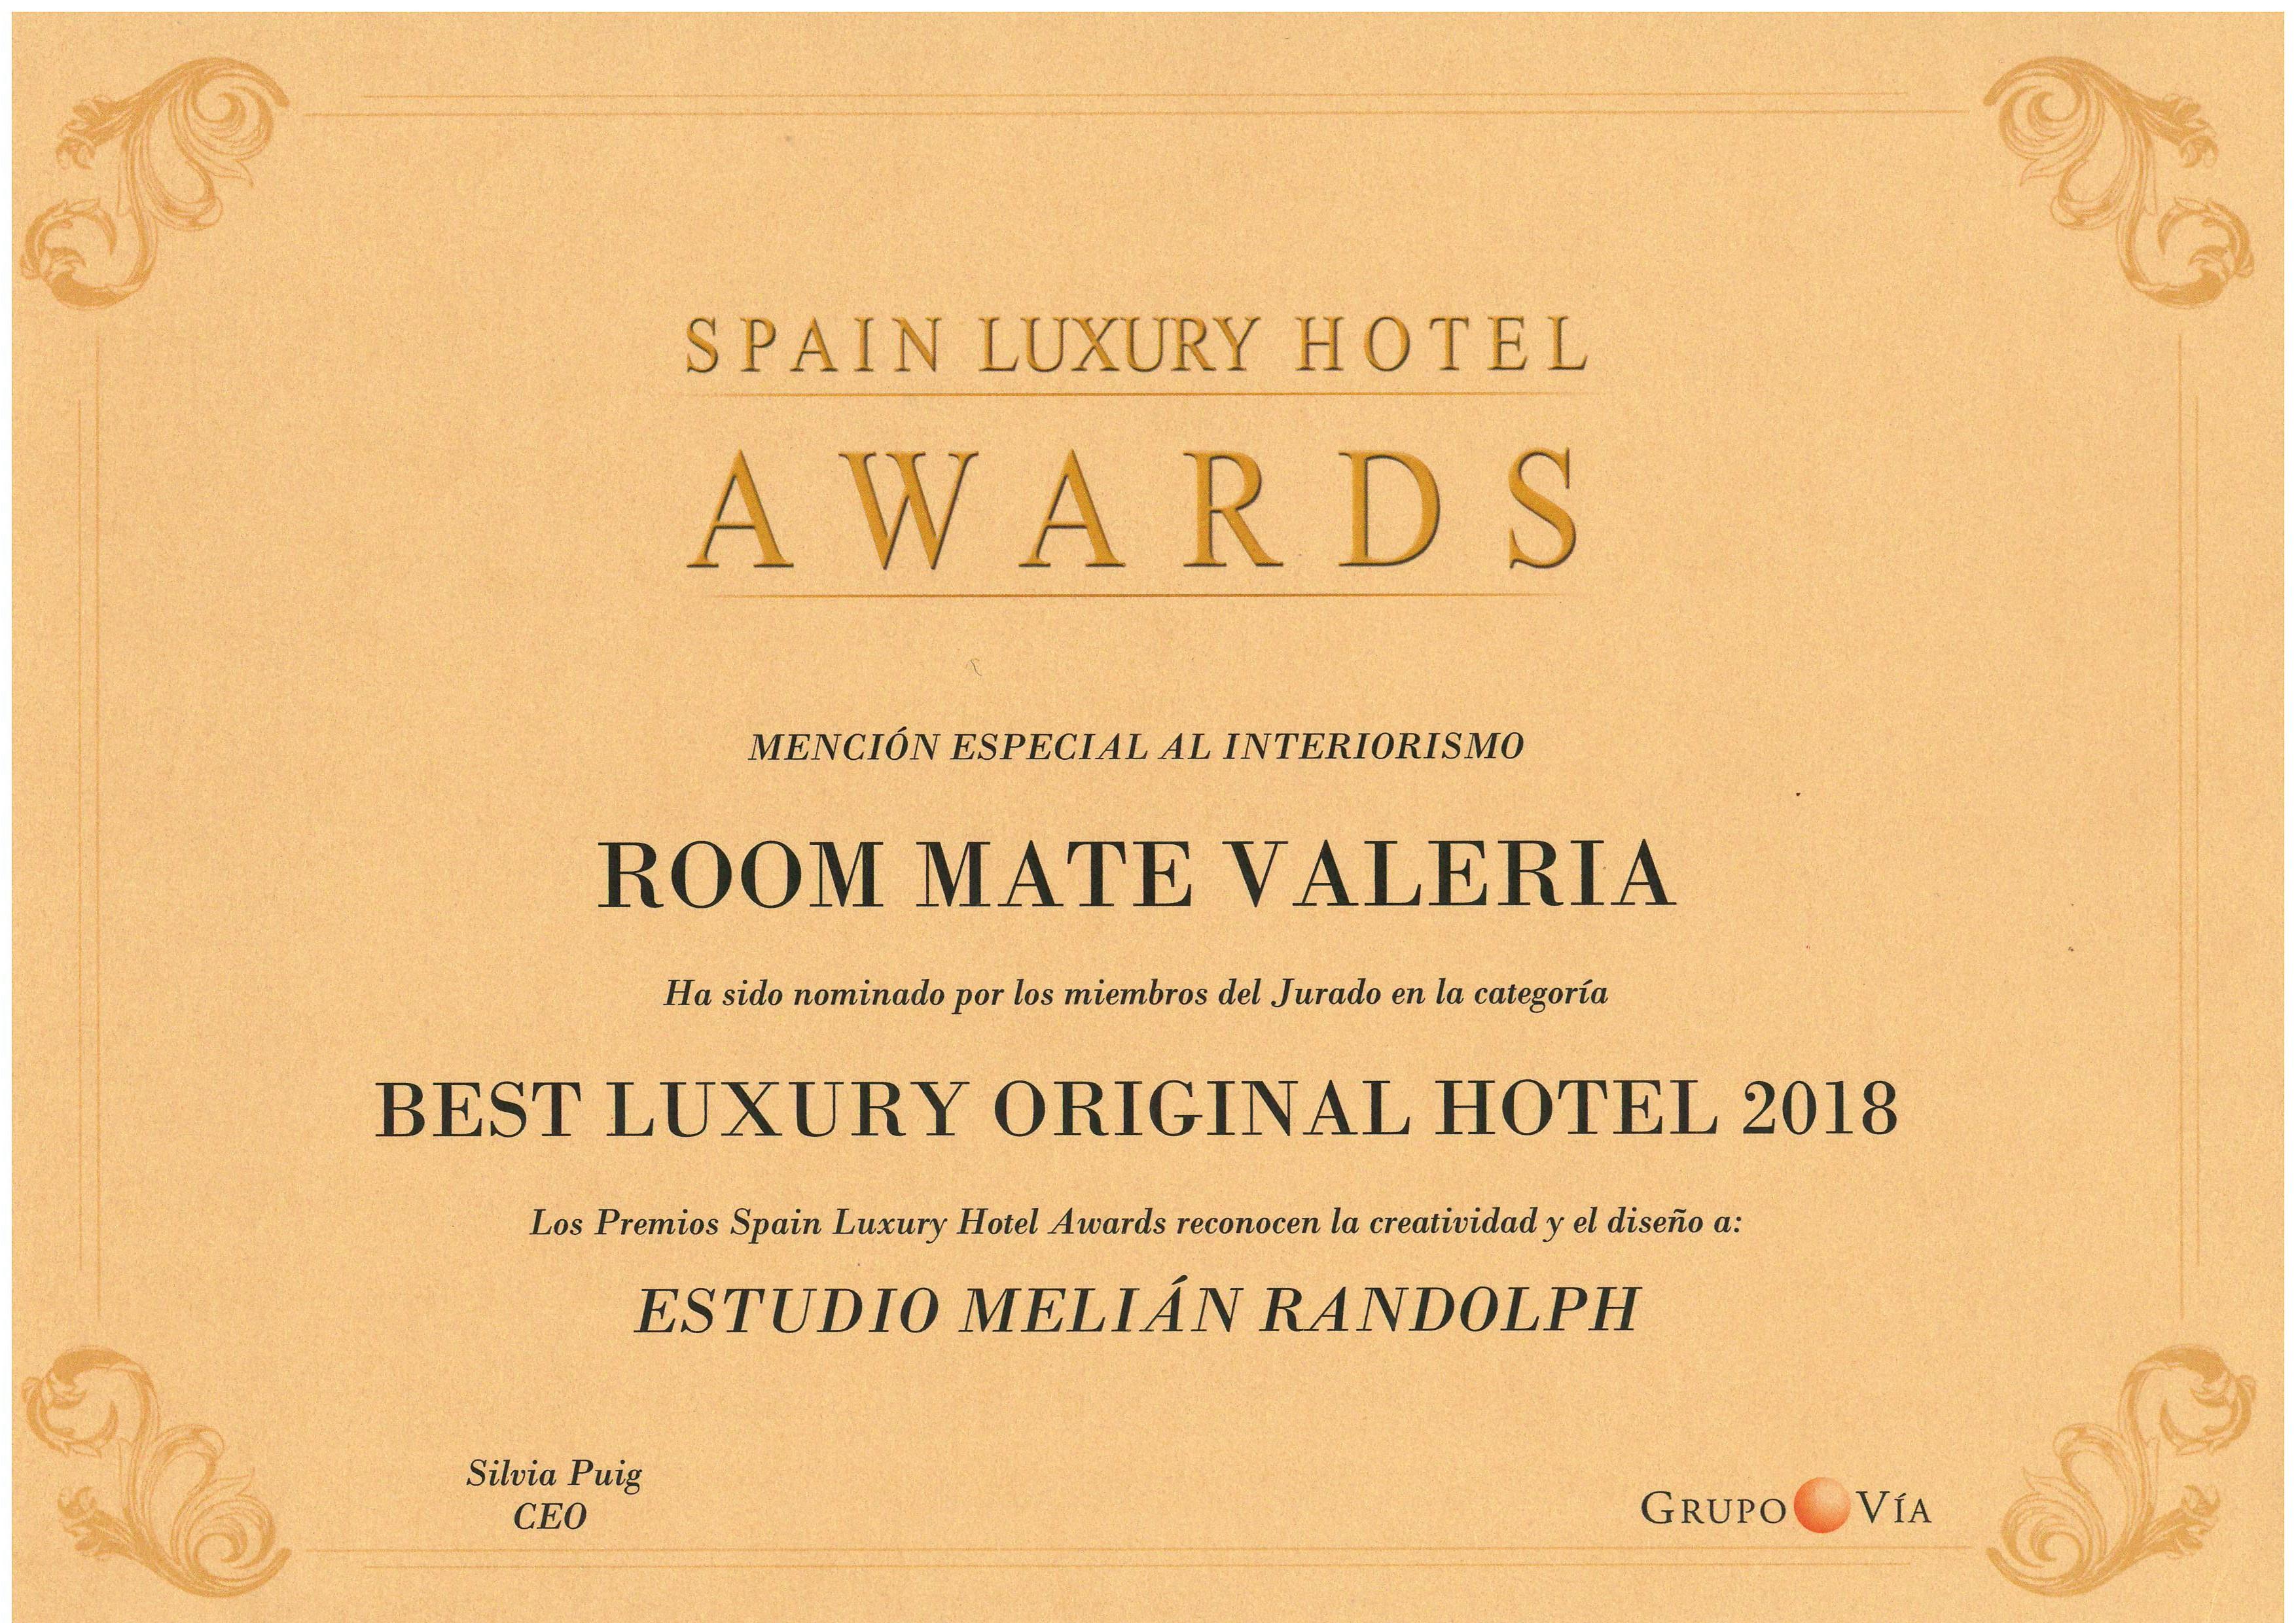 SPAIN LUXURY HOTEL AWARDS